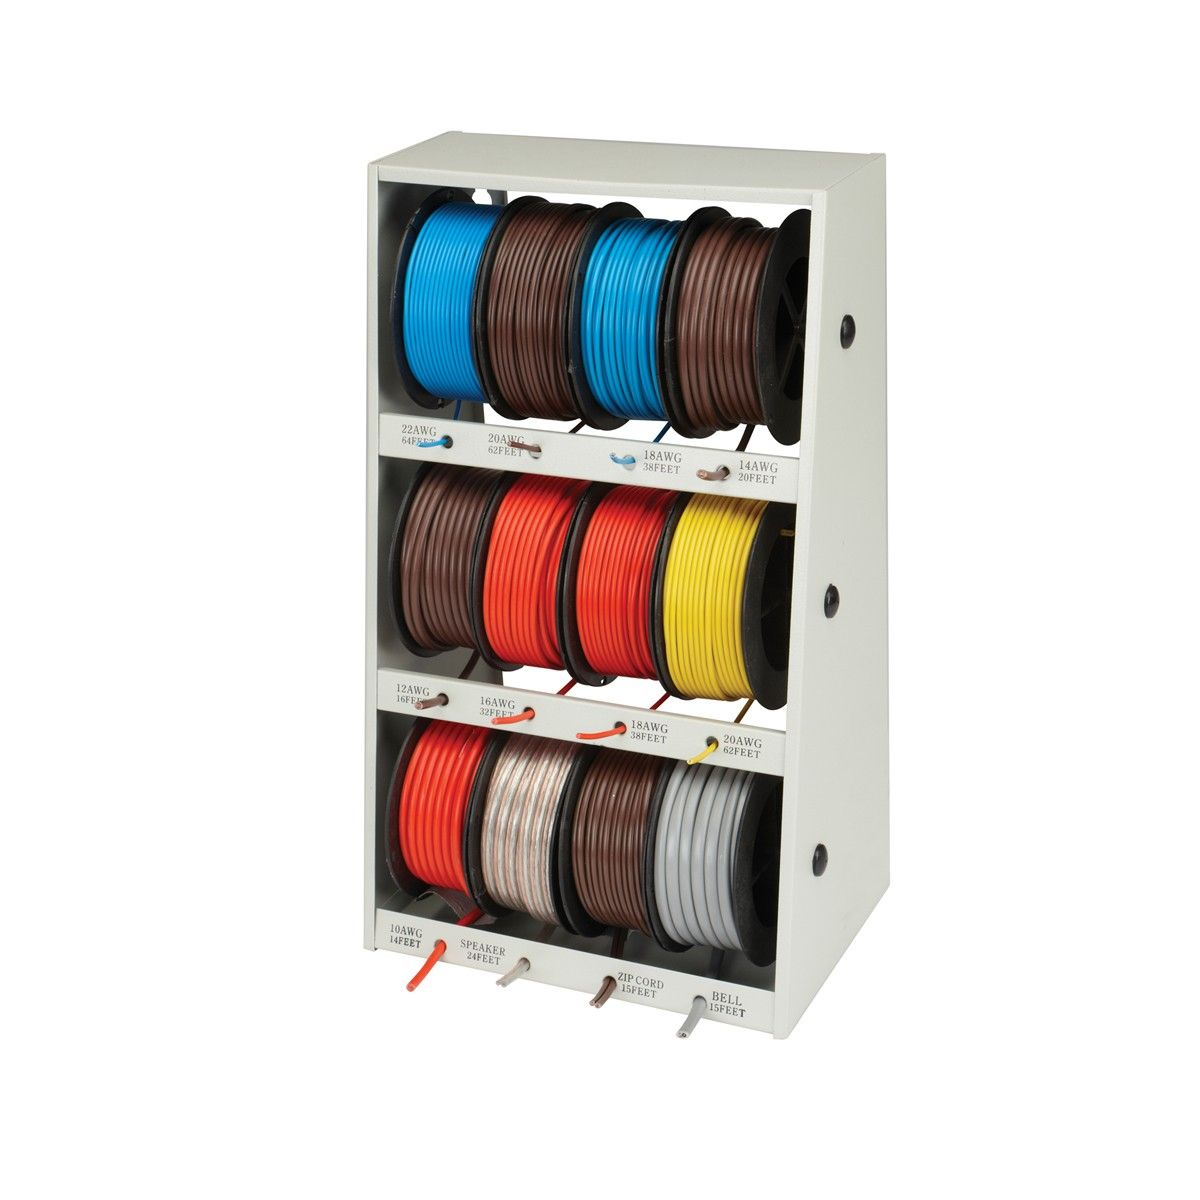 400 ft wire storehouse home workshop workshop organization shop storage electrical wiring [ 1200 x 1200 Pixel ]